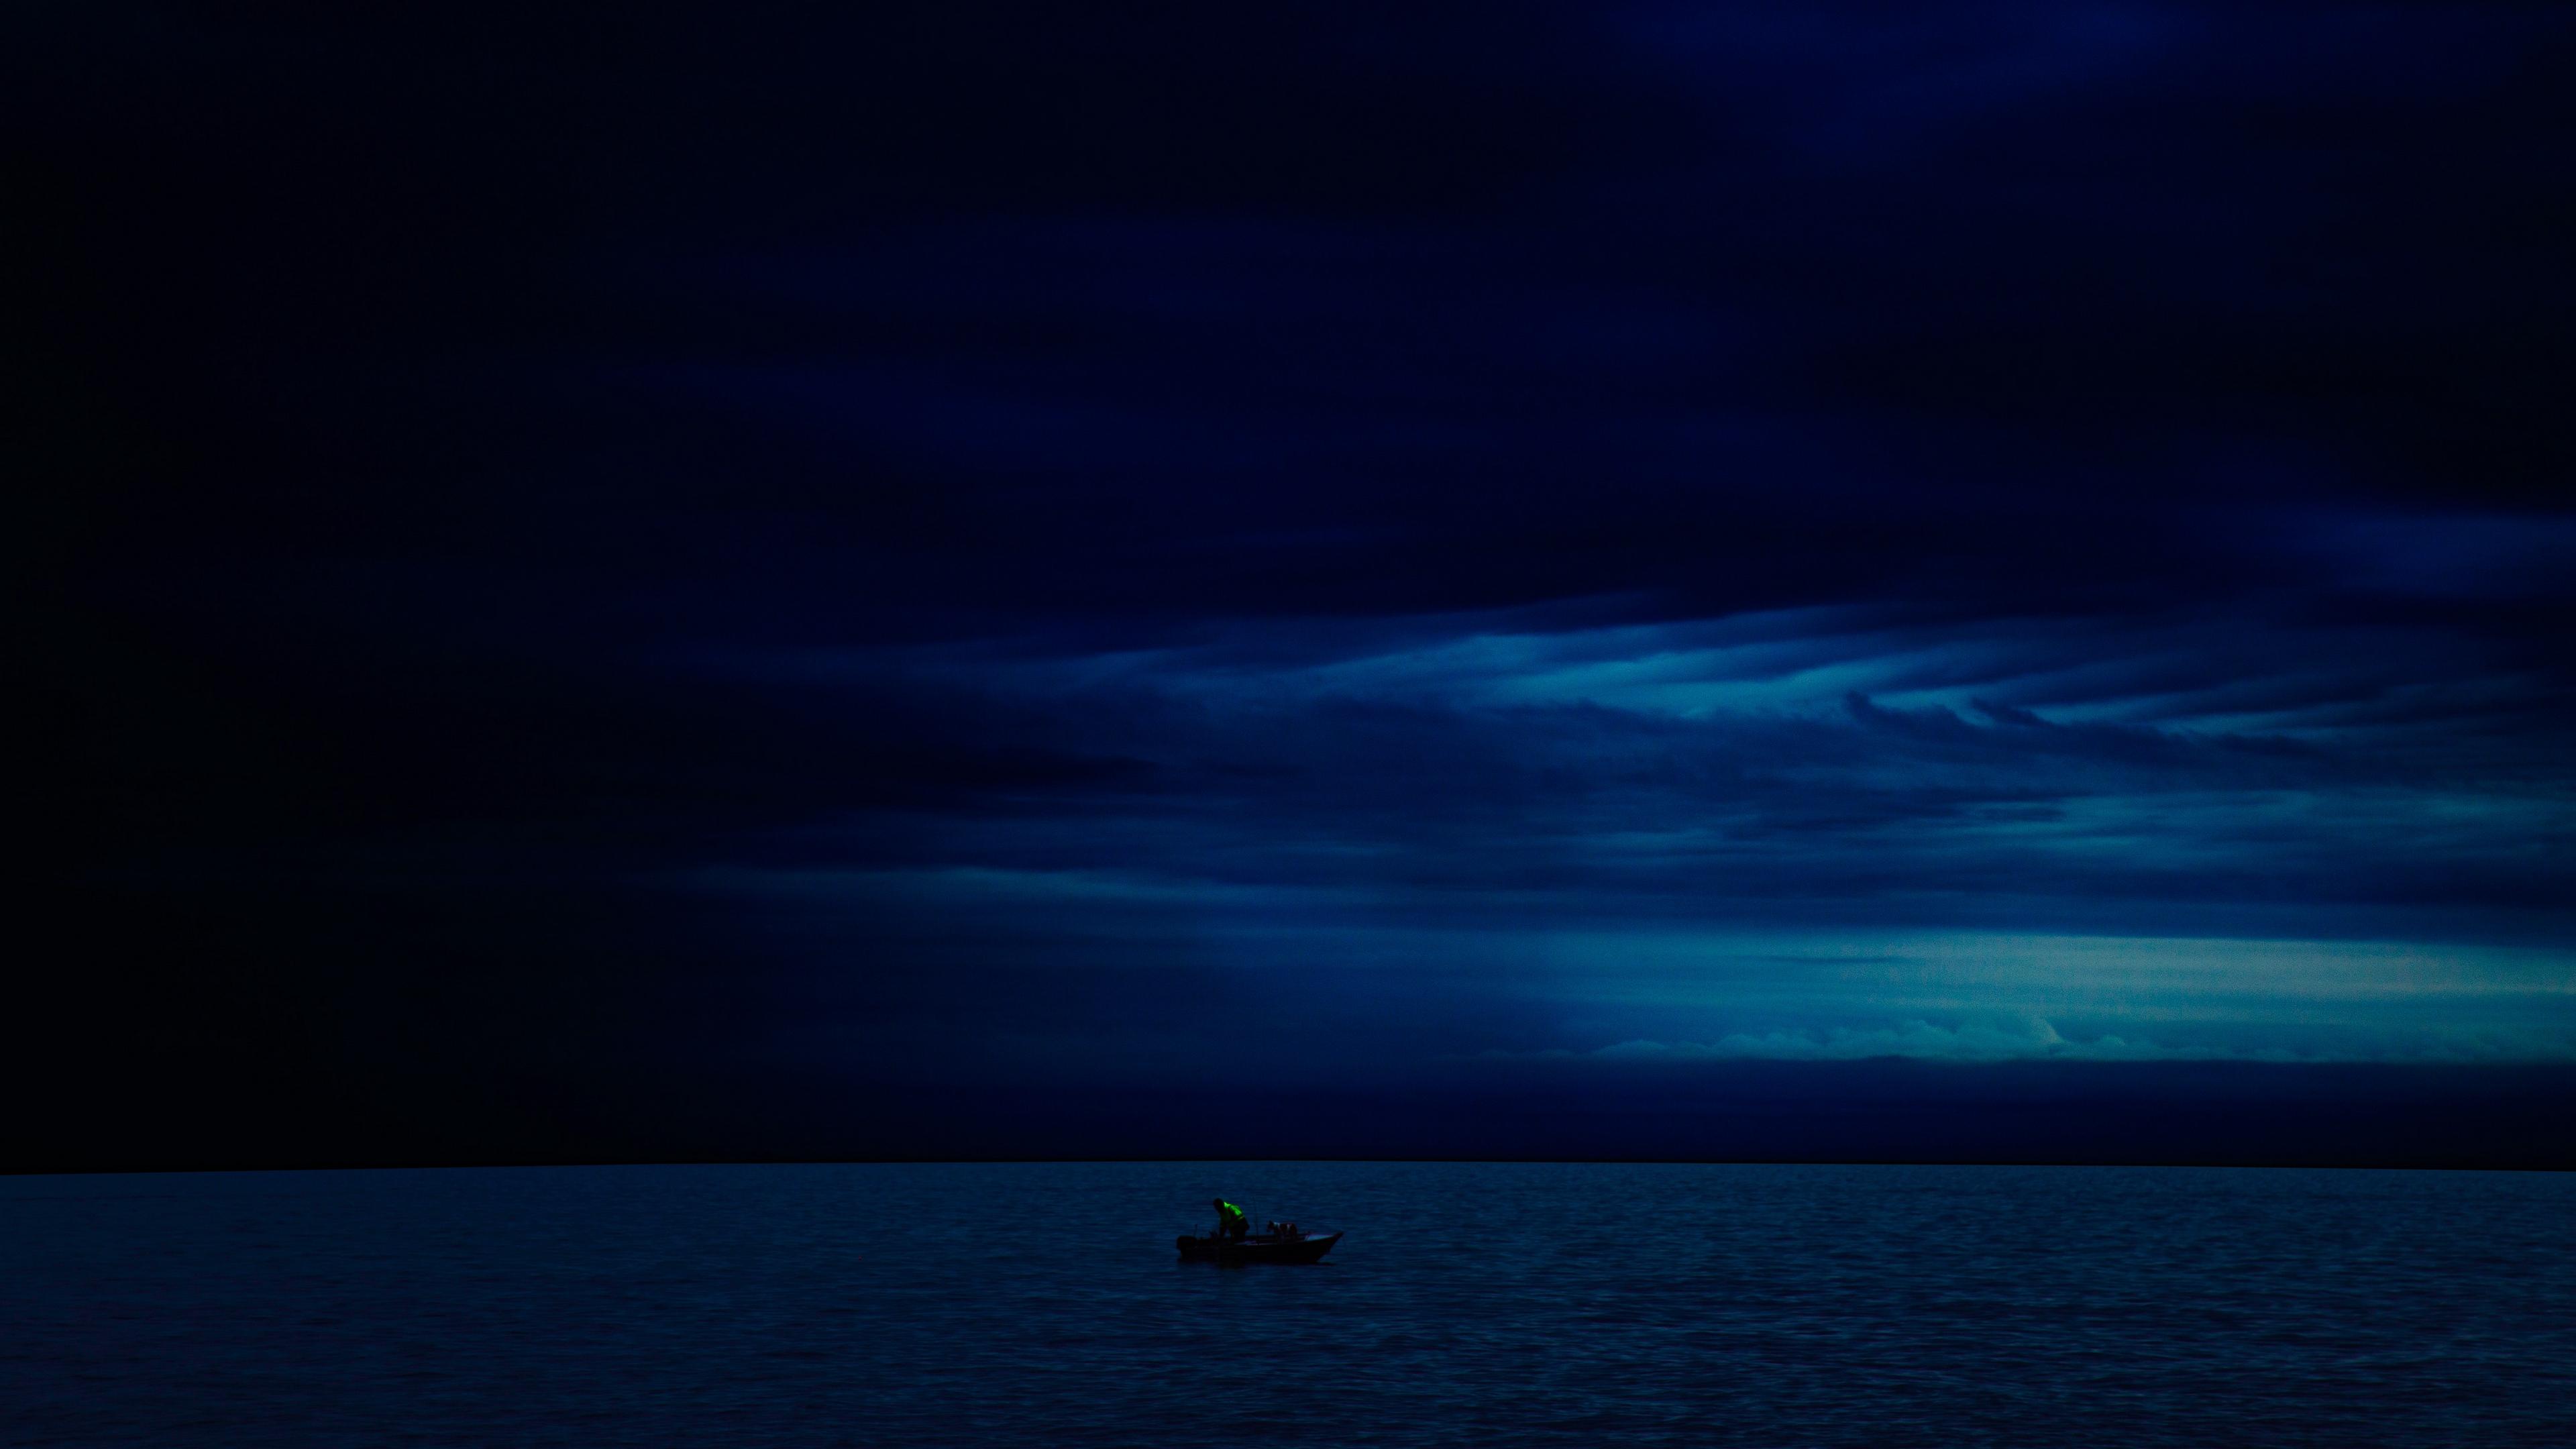 boat night horizon dark 4k 1540575549 - boat, night, horizon, dark 4k - Night, Horizon, Boat